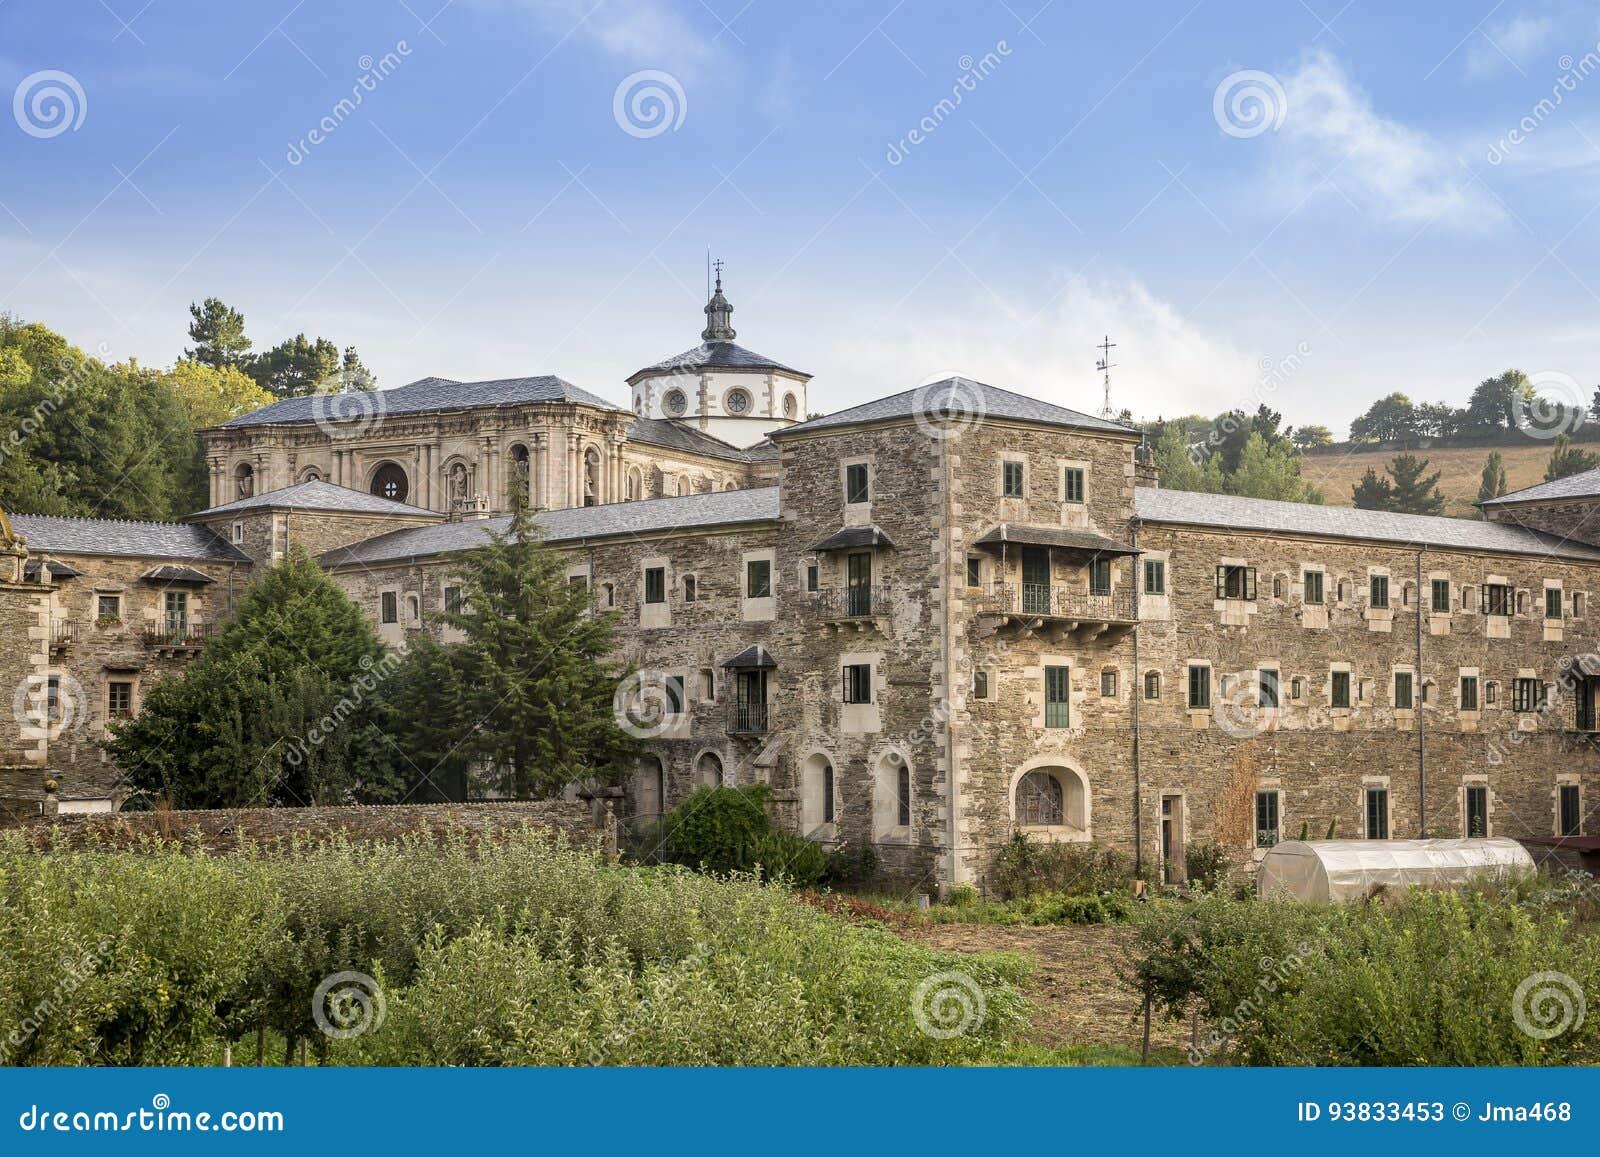 Monastery Of St Julian Of Samos Province Of Lugo Galicia Spain Stock Image Image Of Landscape Church 93833453